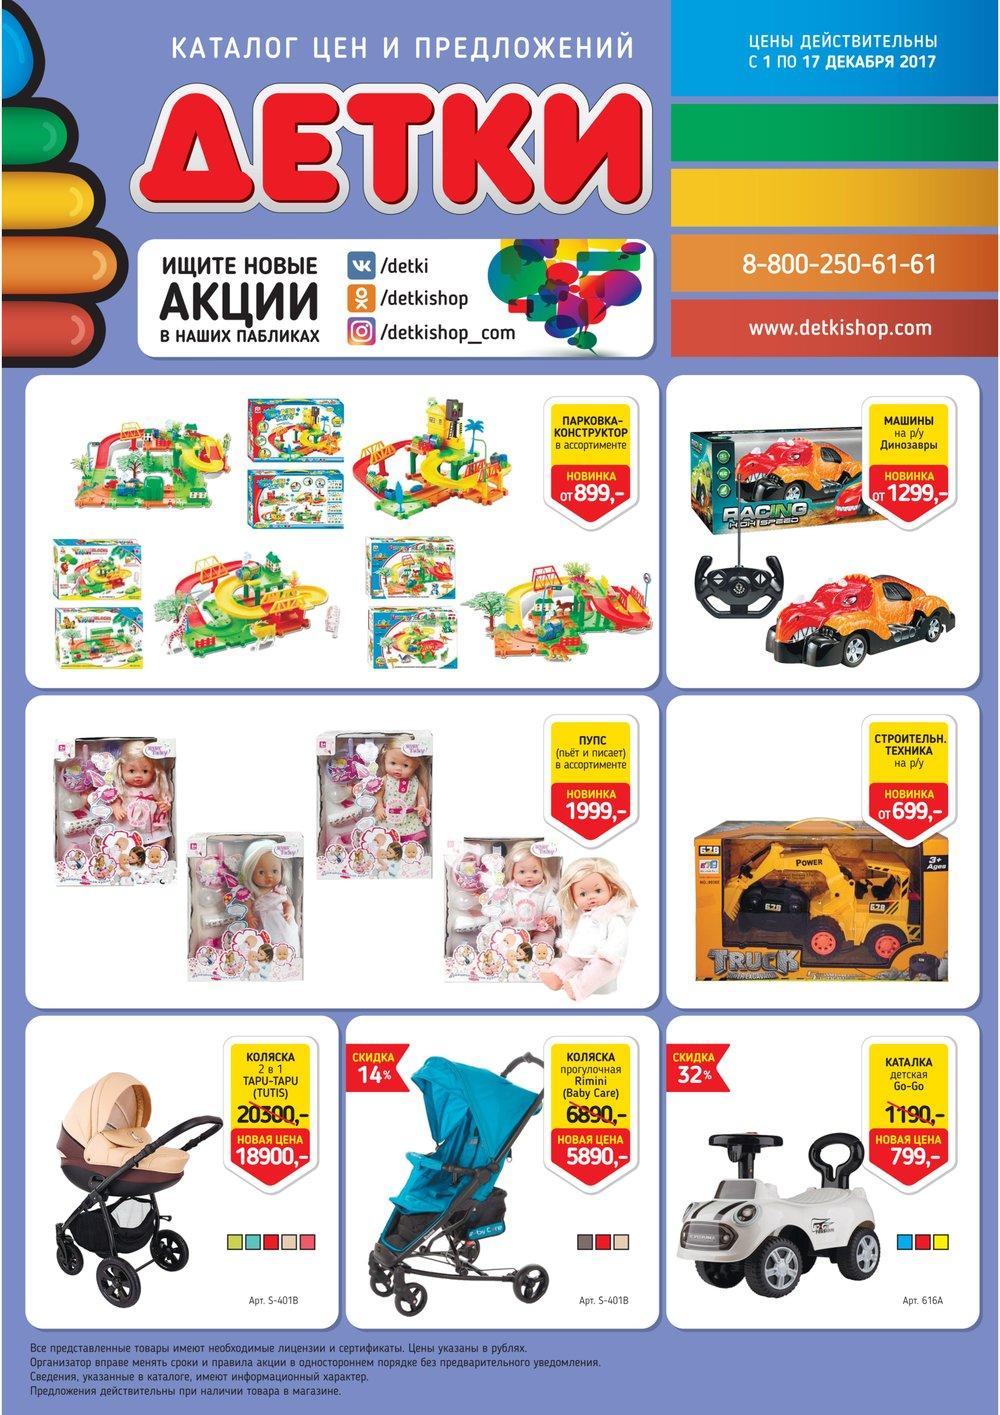 Каталог акций Детки с 1 по 17 декабря 2017 - стр. 1